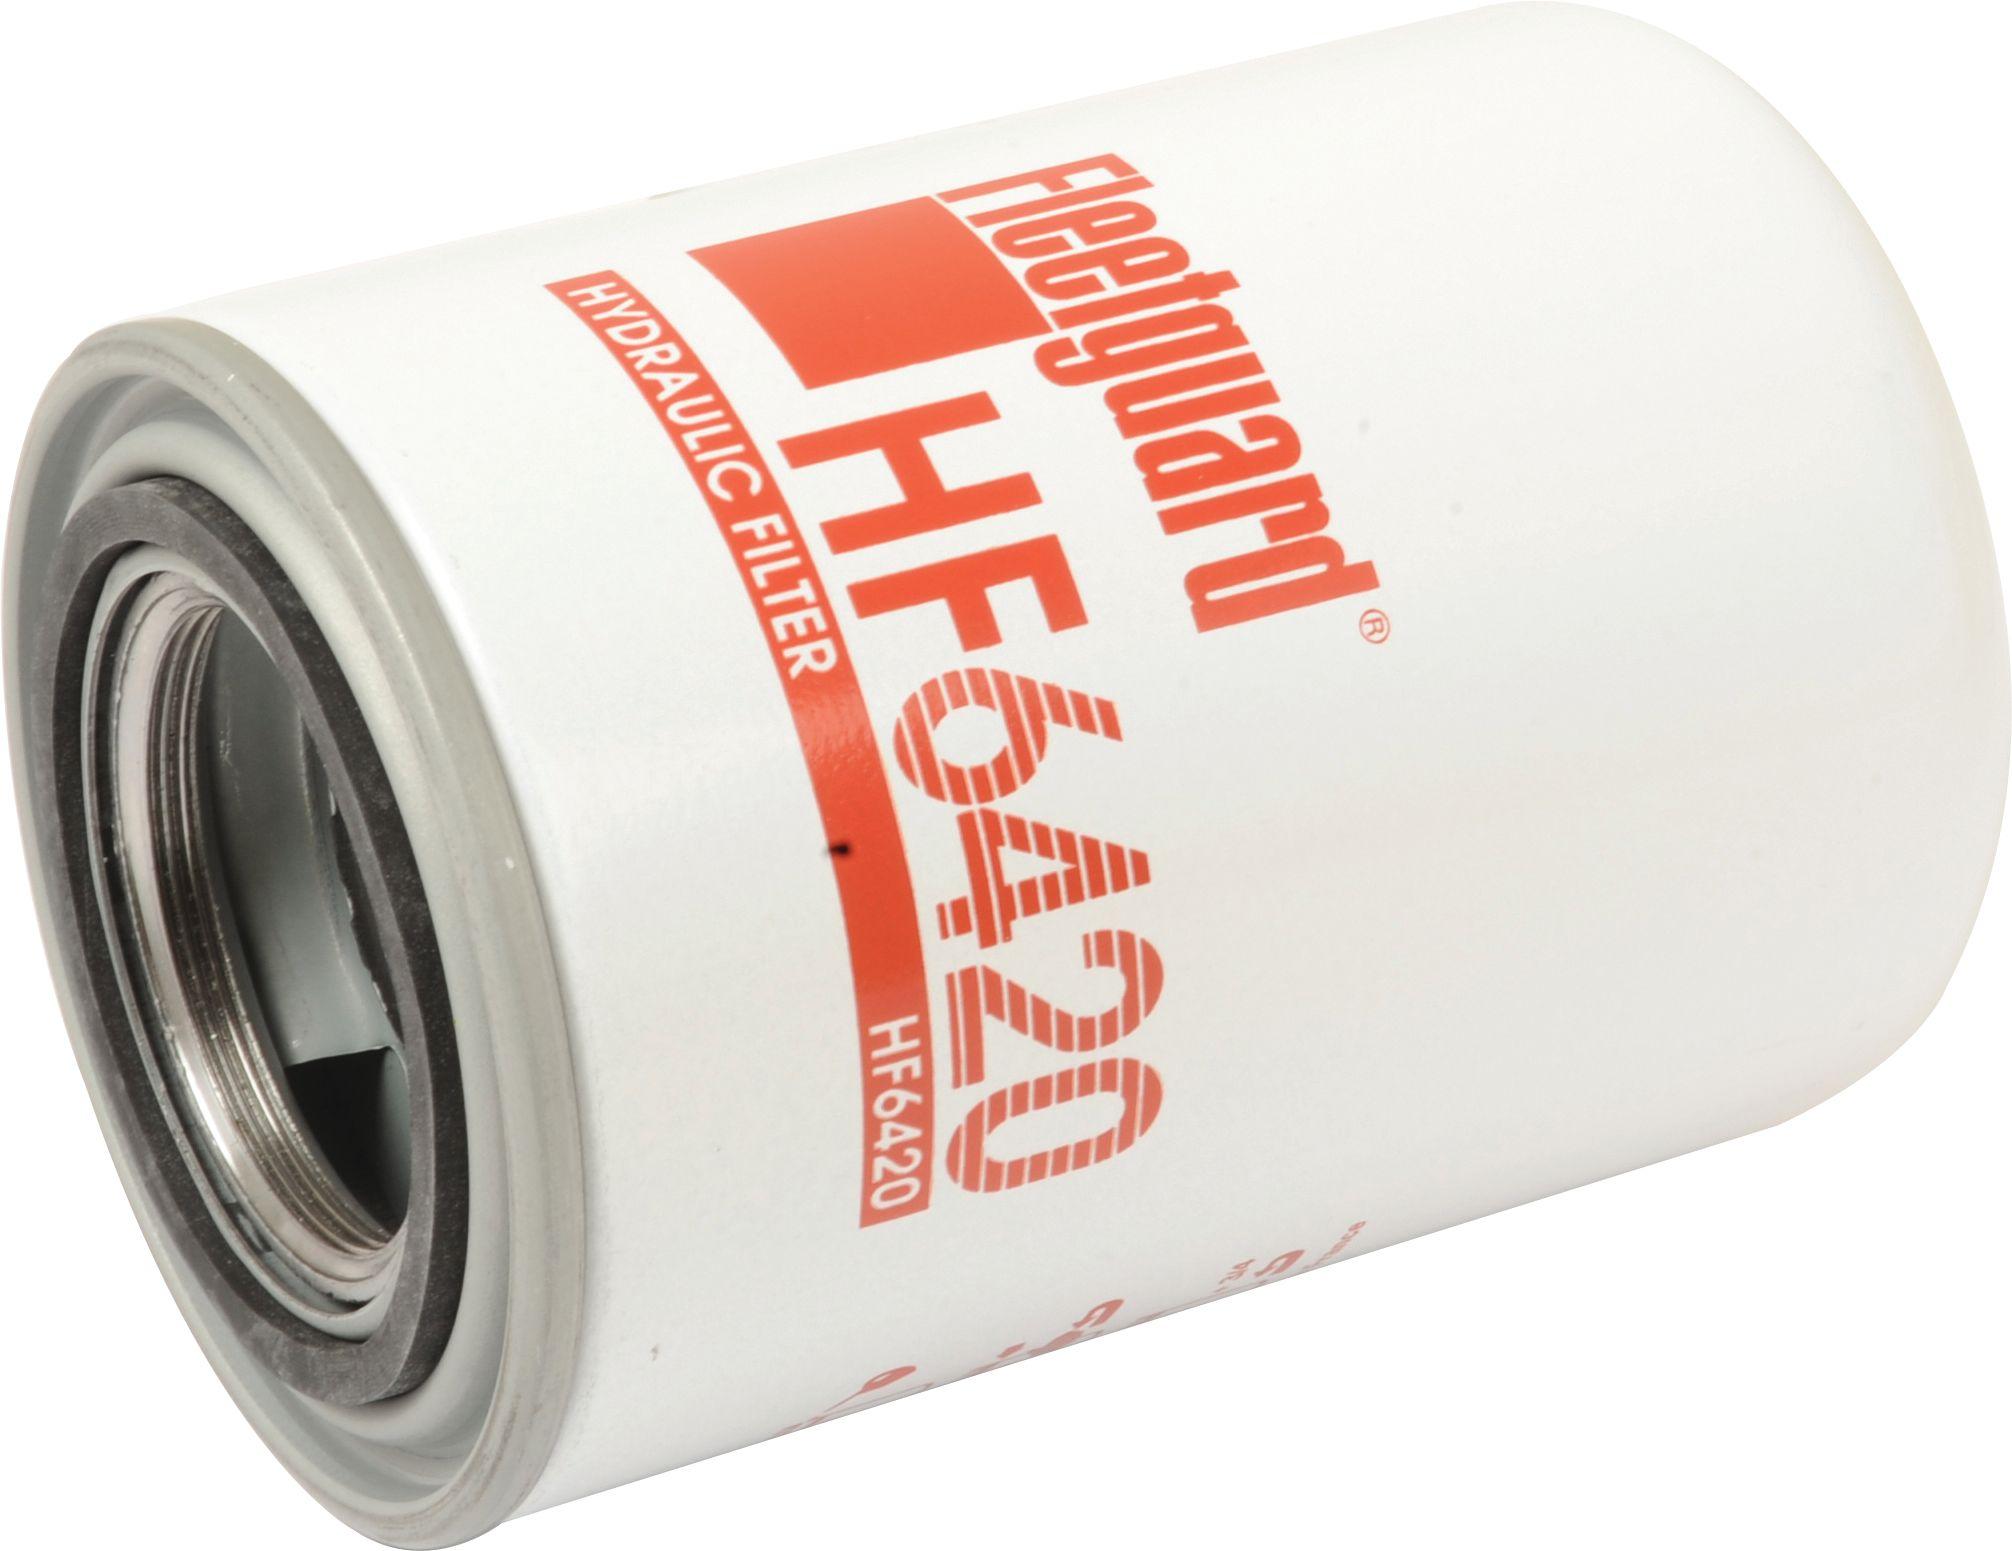 MATBRO HYDRAULIC FILTER HF6420 109321